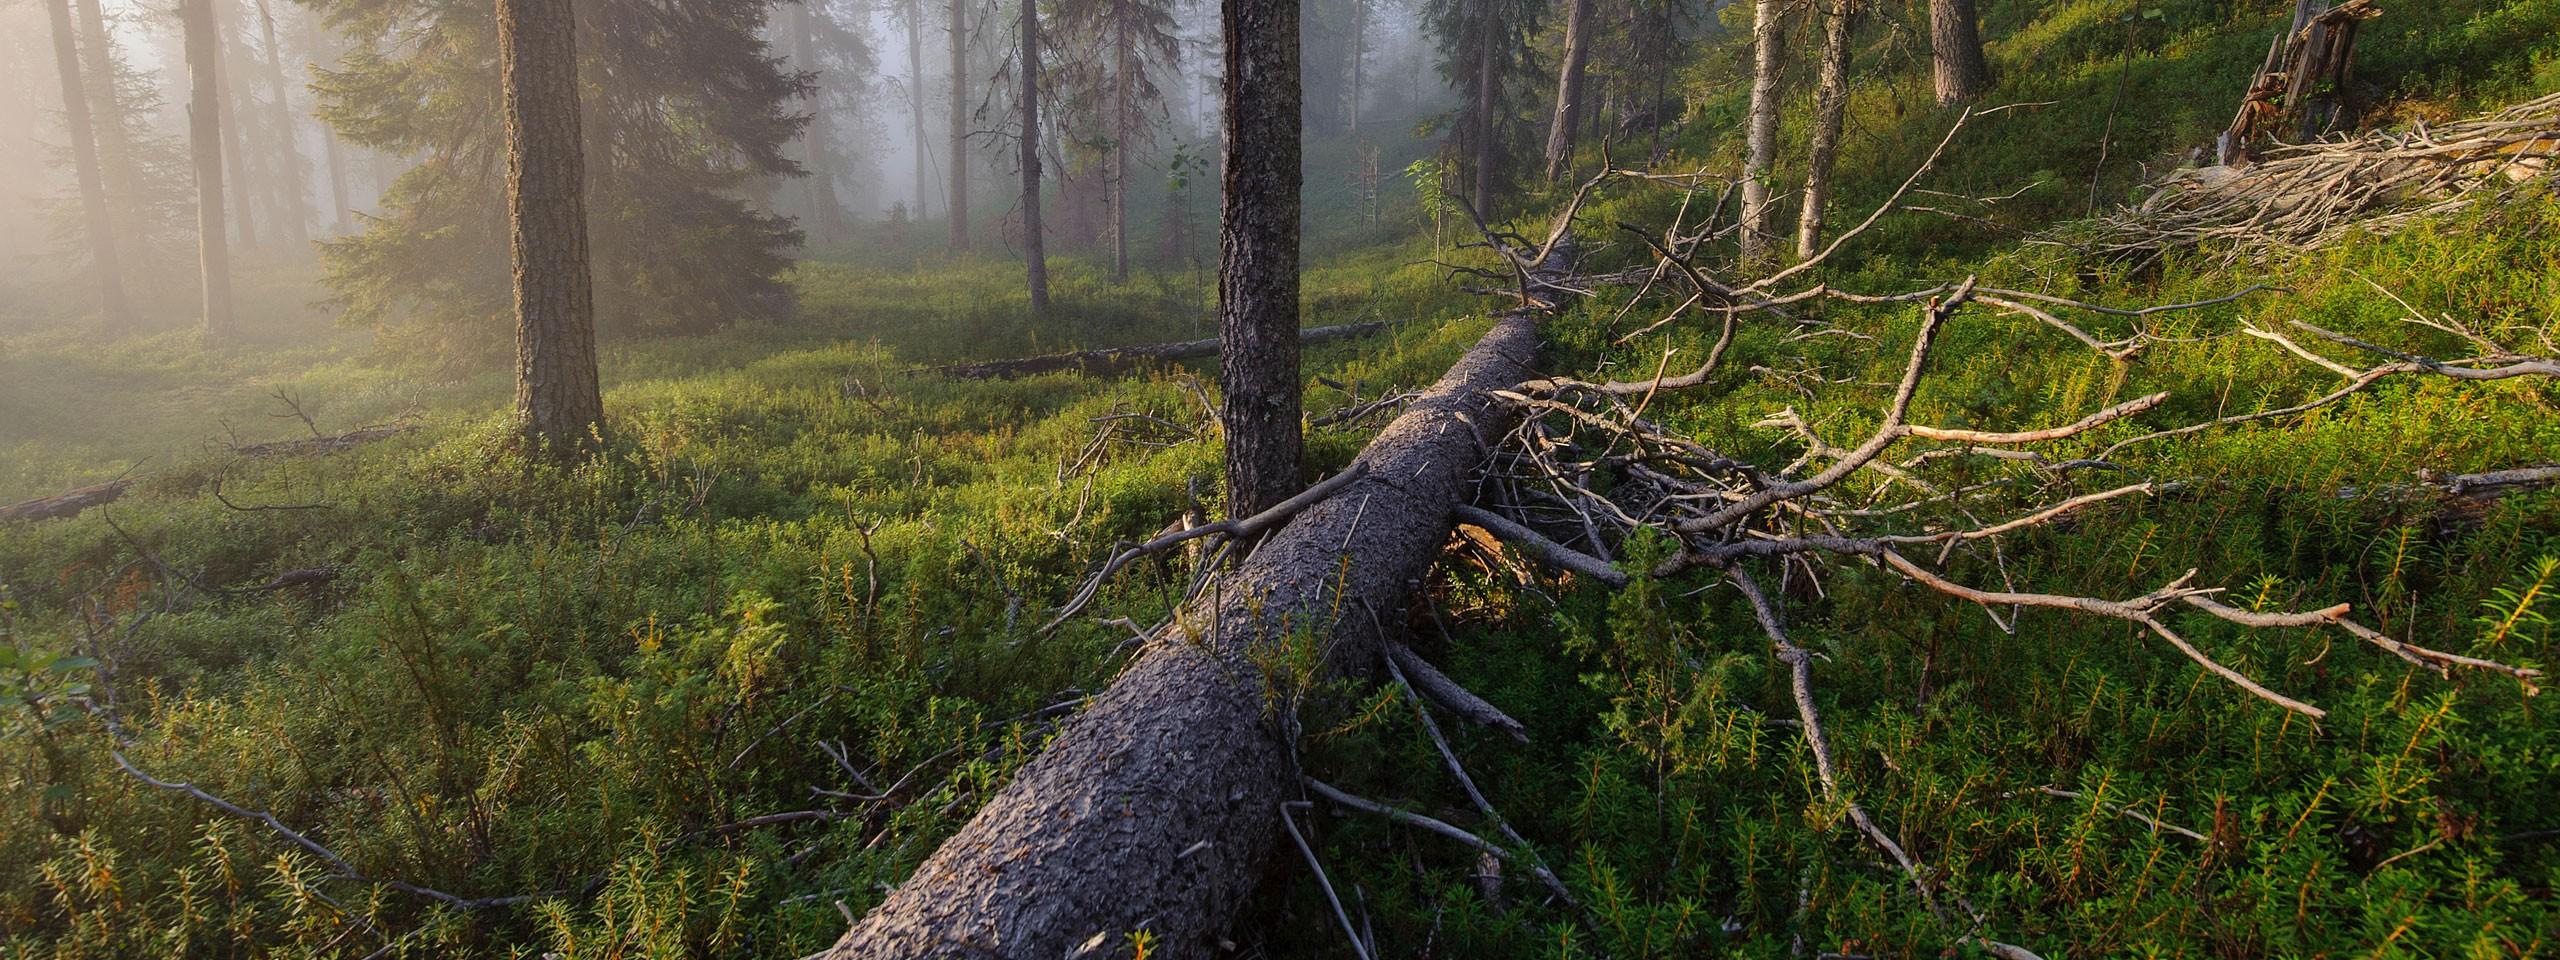 © Erik Saarnio / Vastavalo